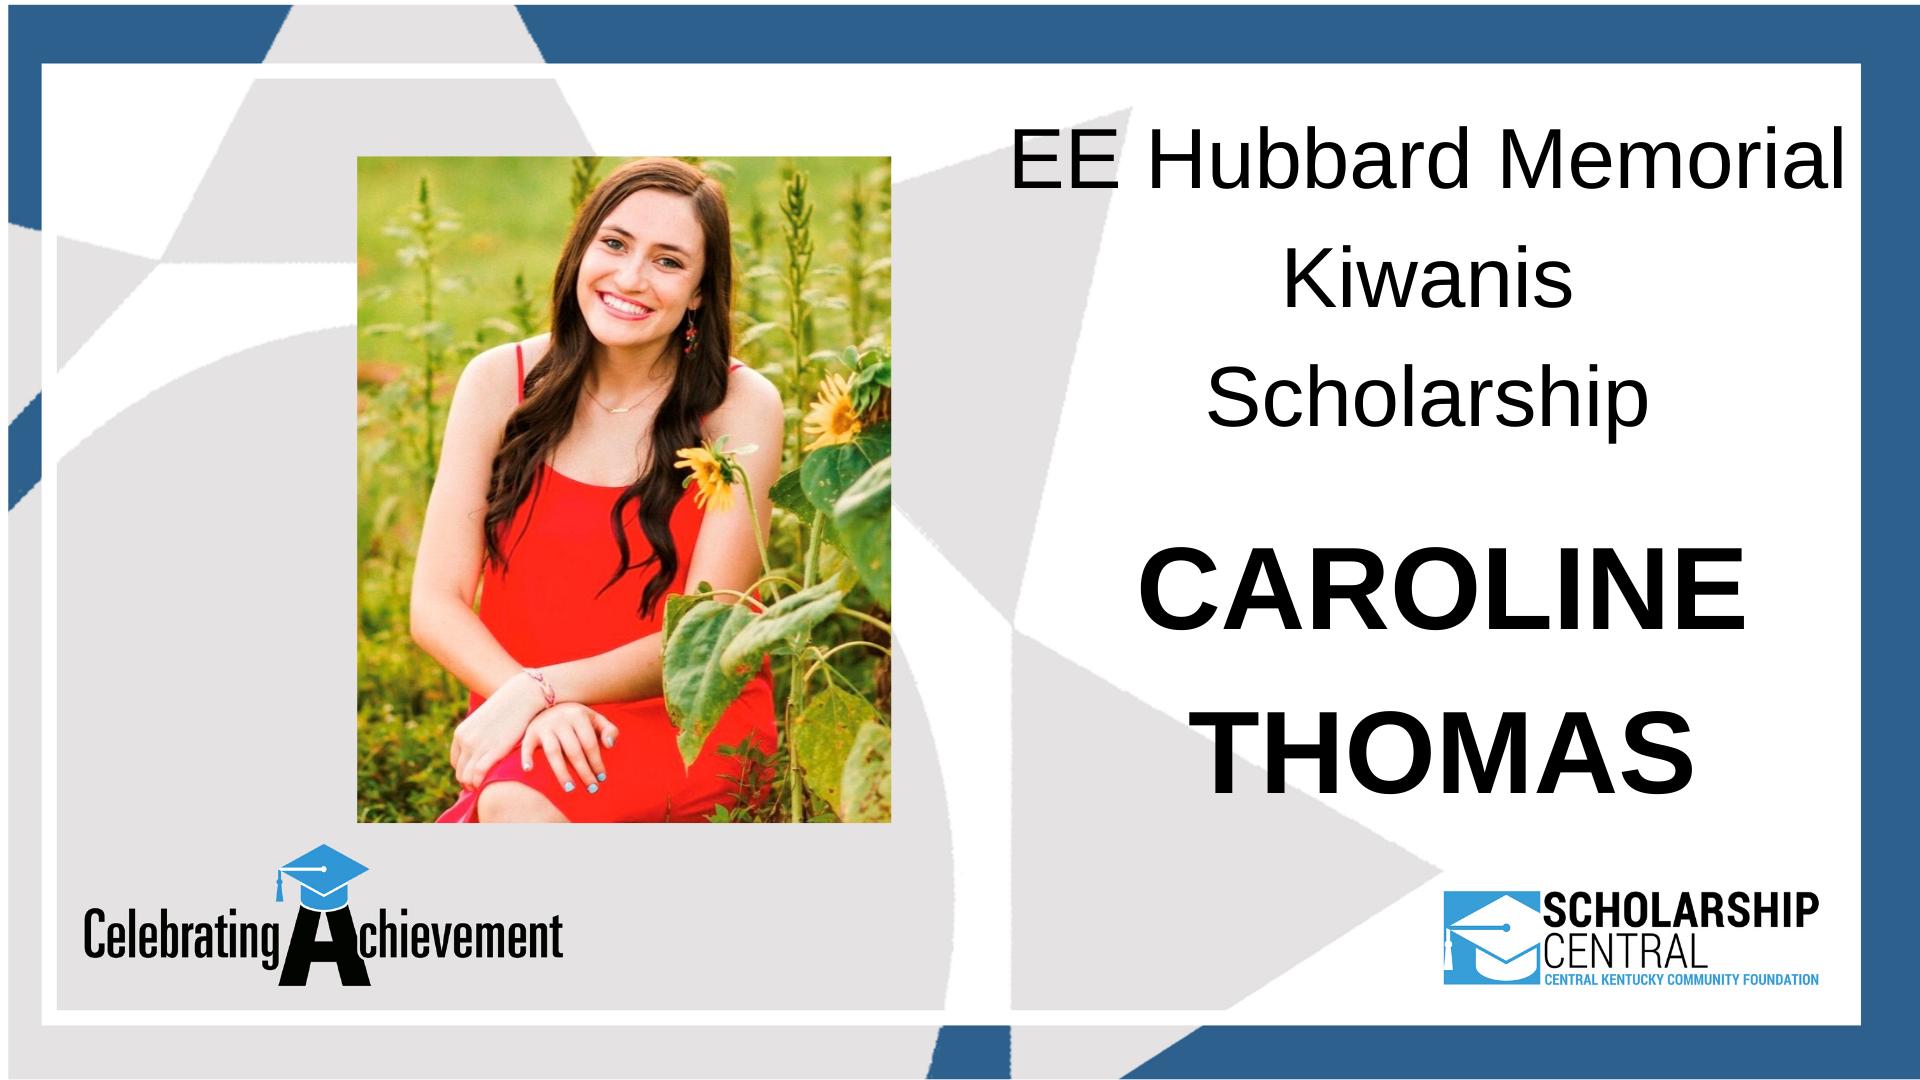 EE Hubbard Memorial Kiwanis Scholarship